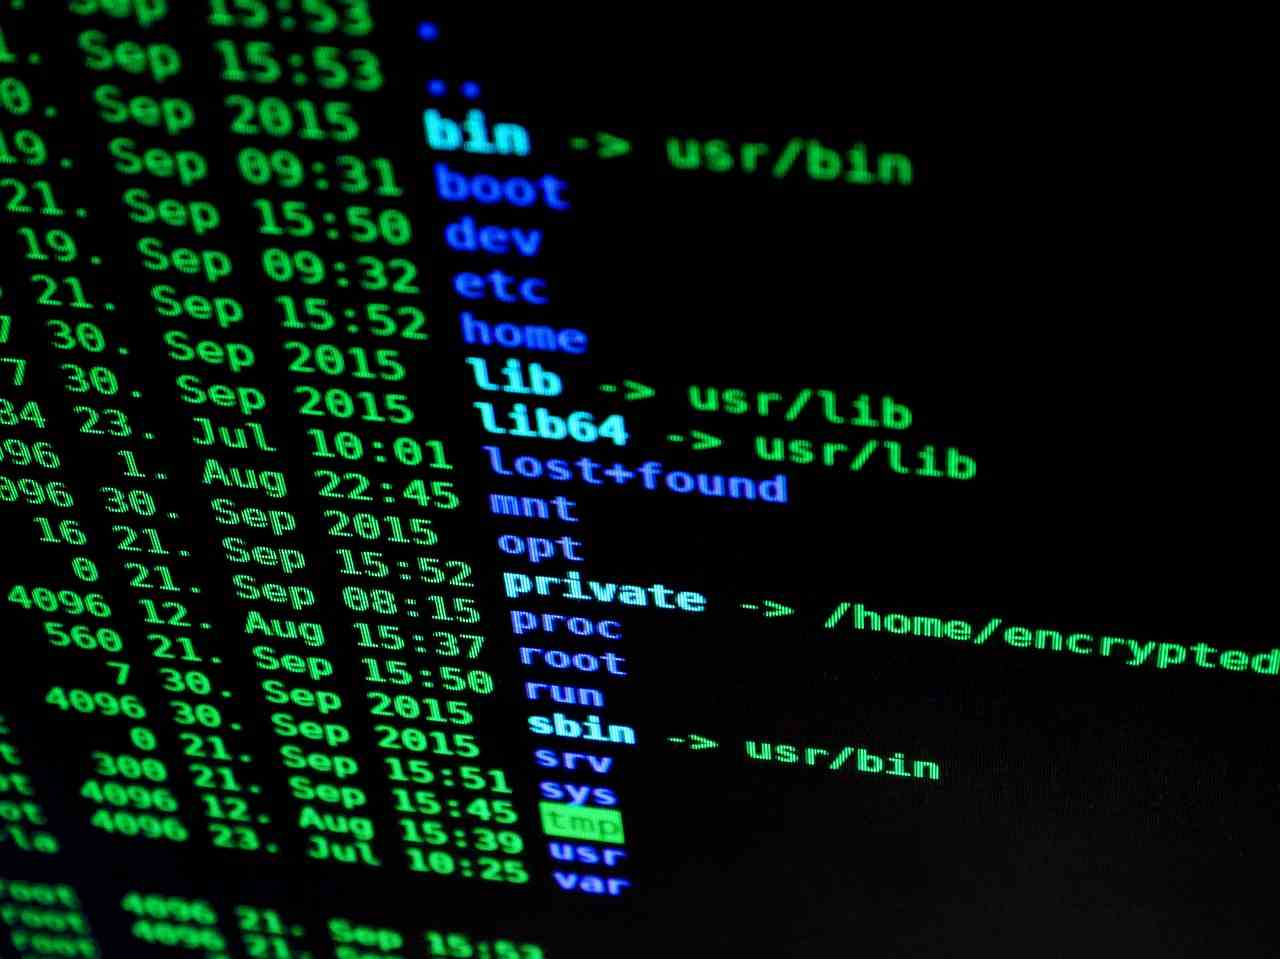 Solarwinds, hacker attaccano 100 aziende e 9 agenzie federali